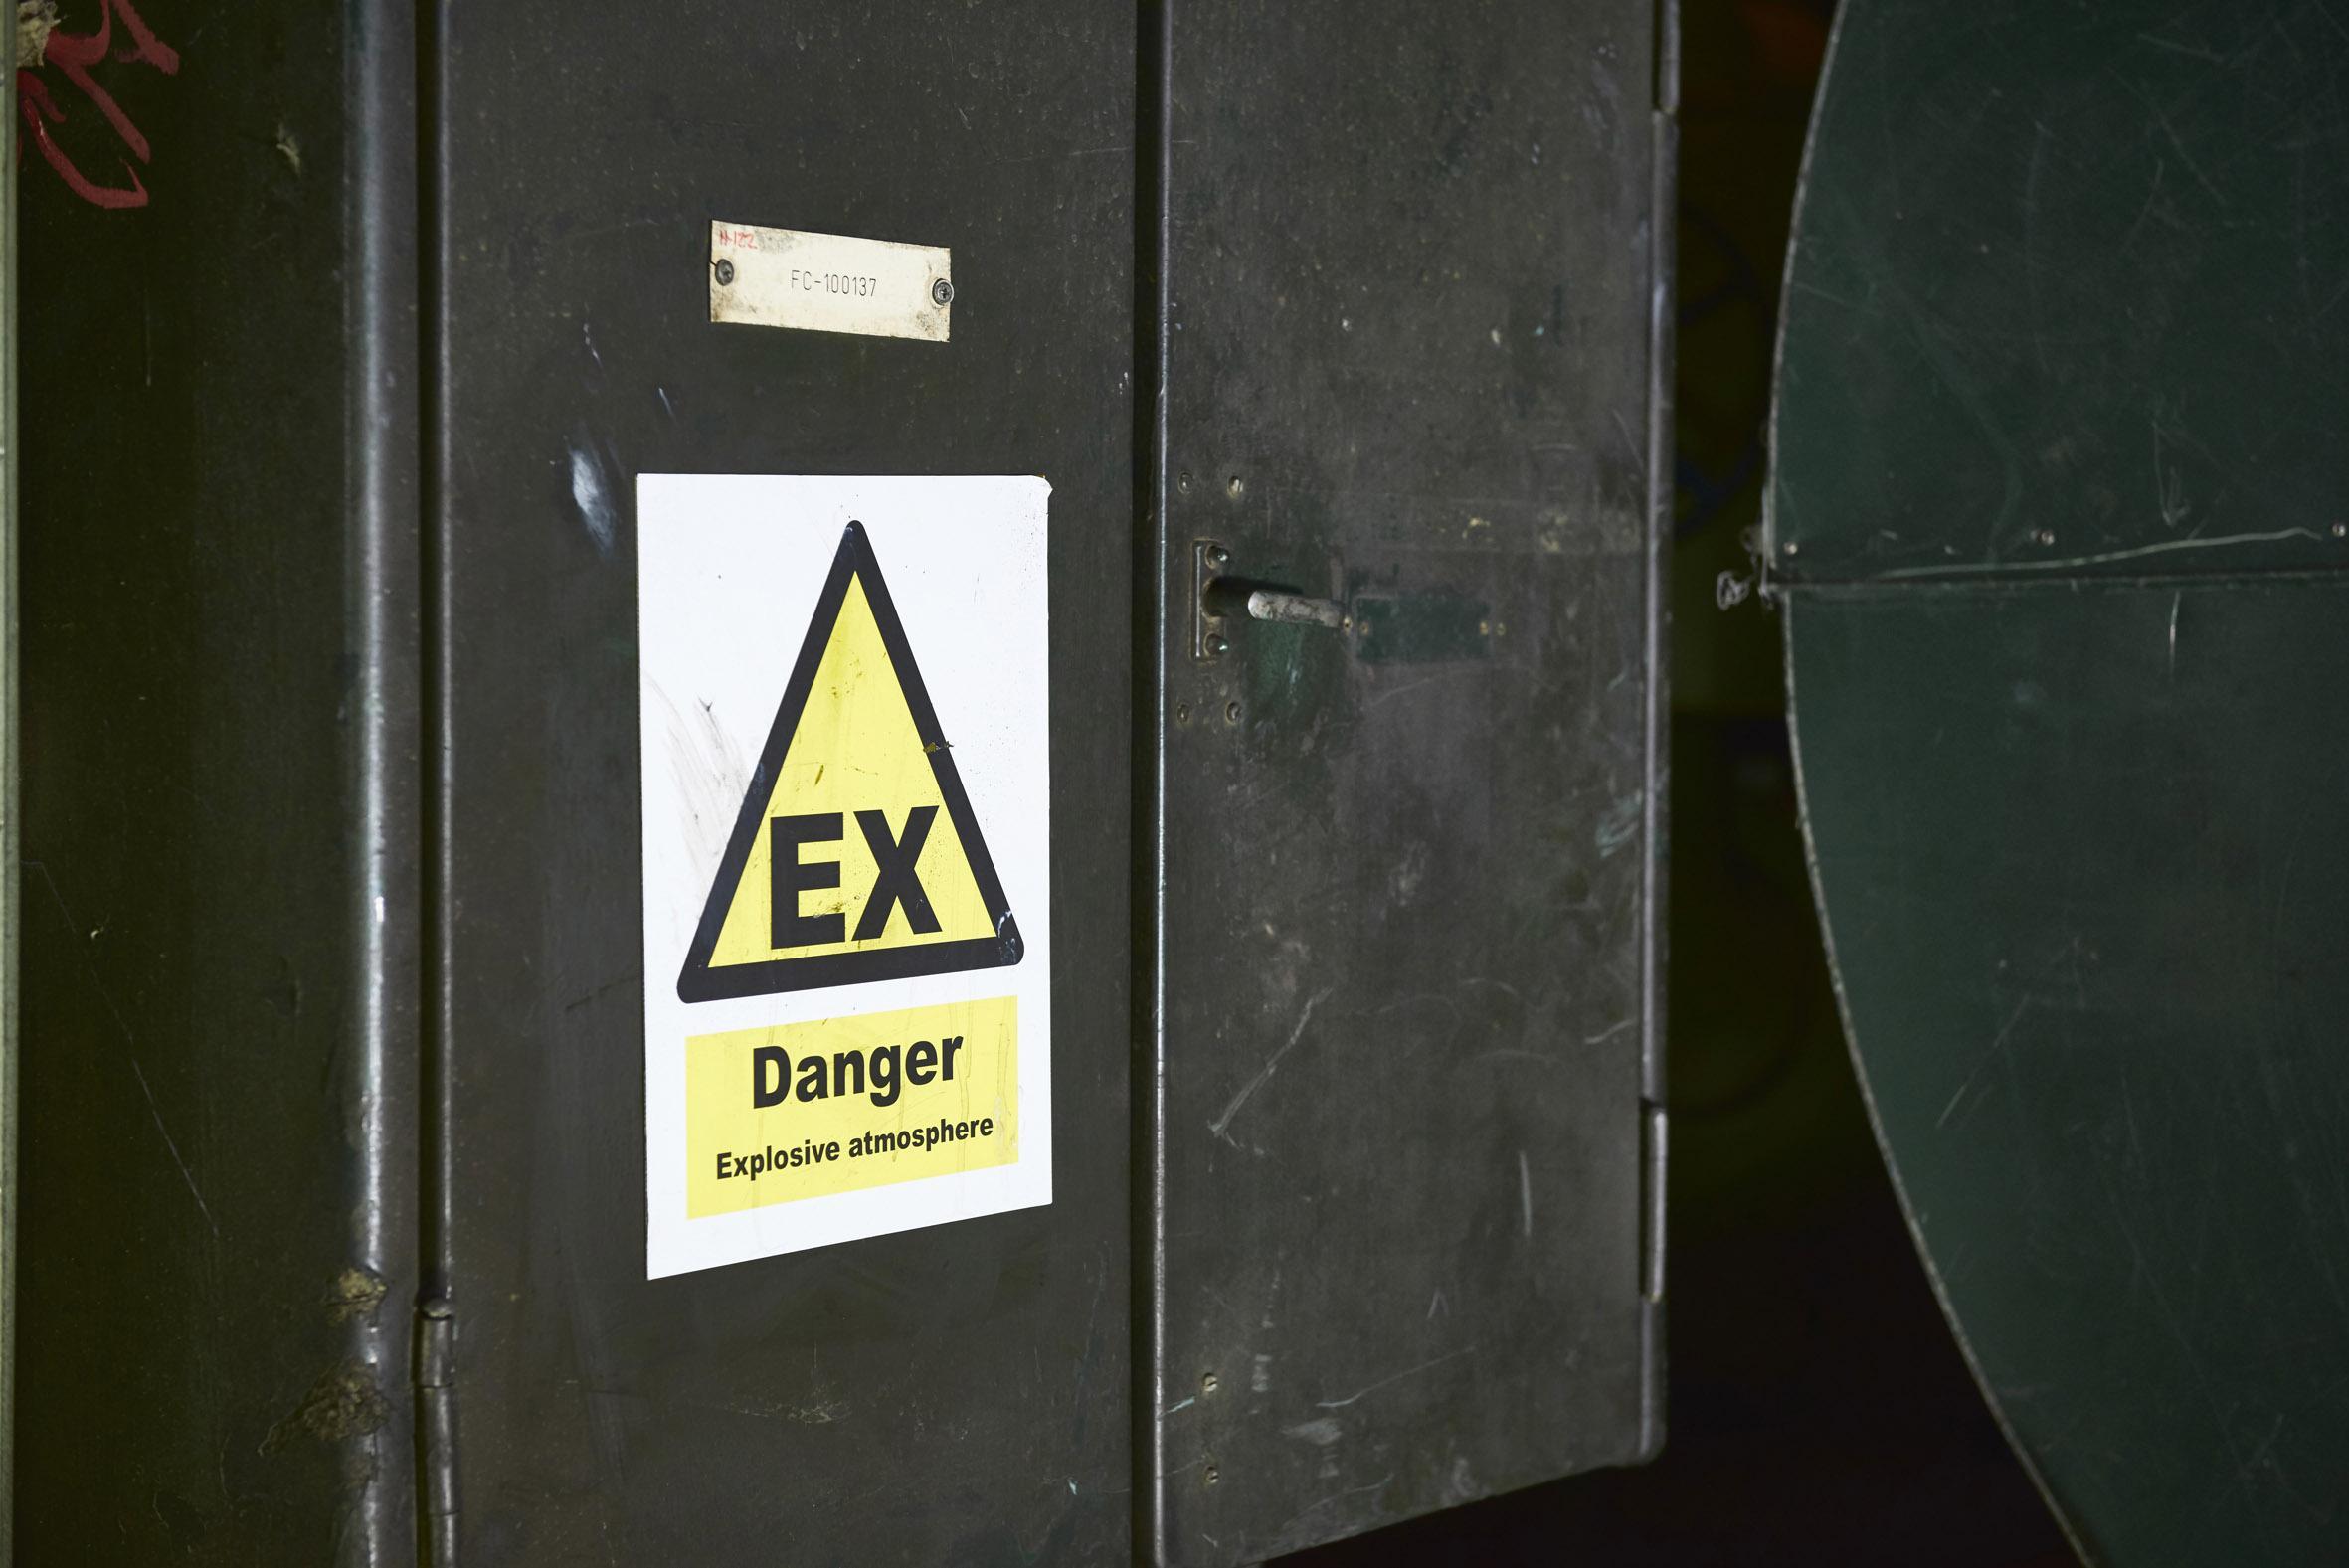 Hazardous area sign in oil refinery